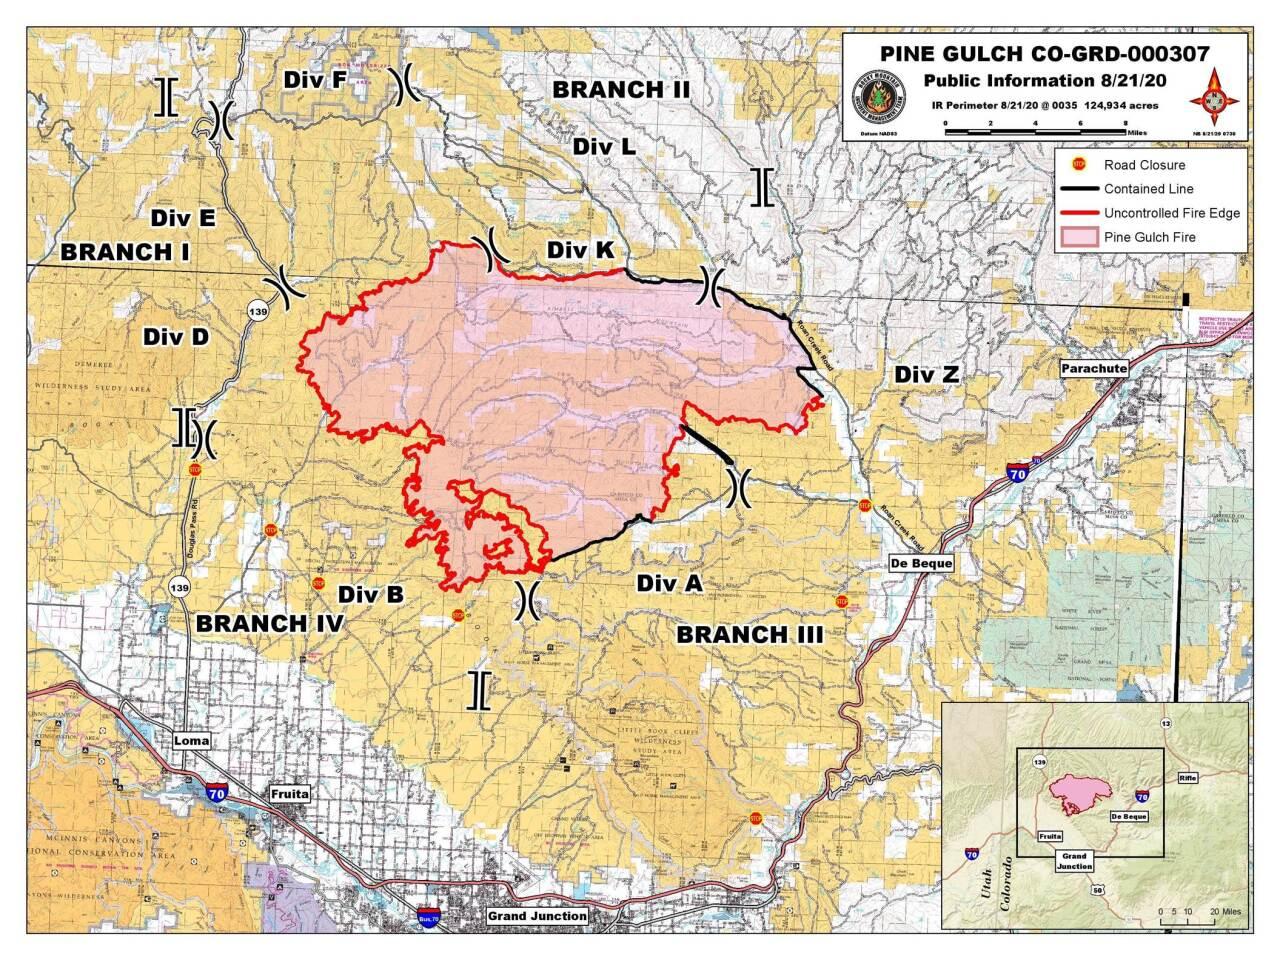 Pine Gulch Fire map_Aug 21 2020